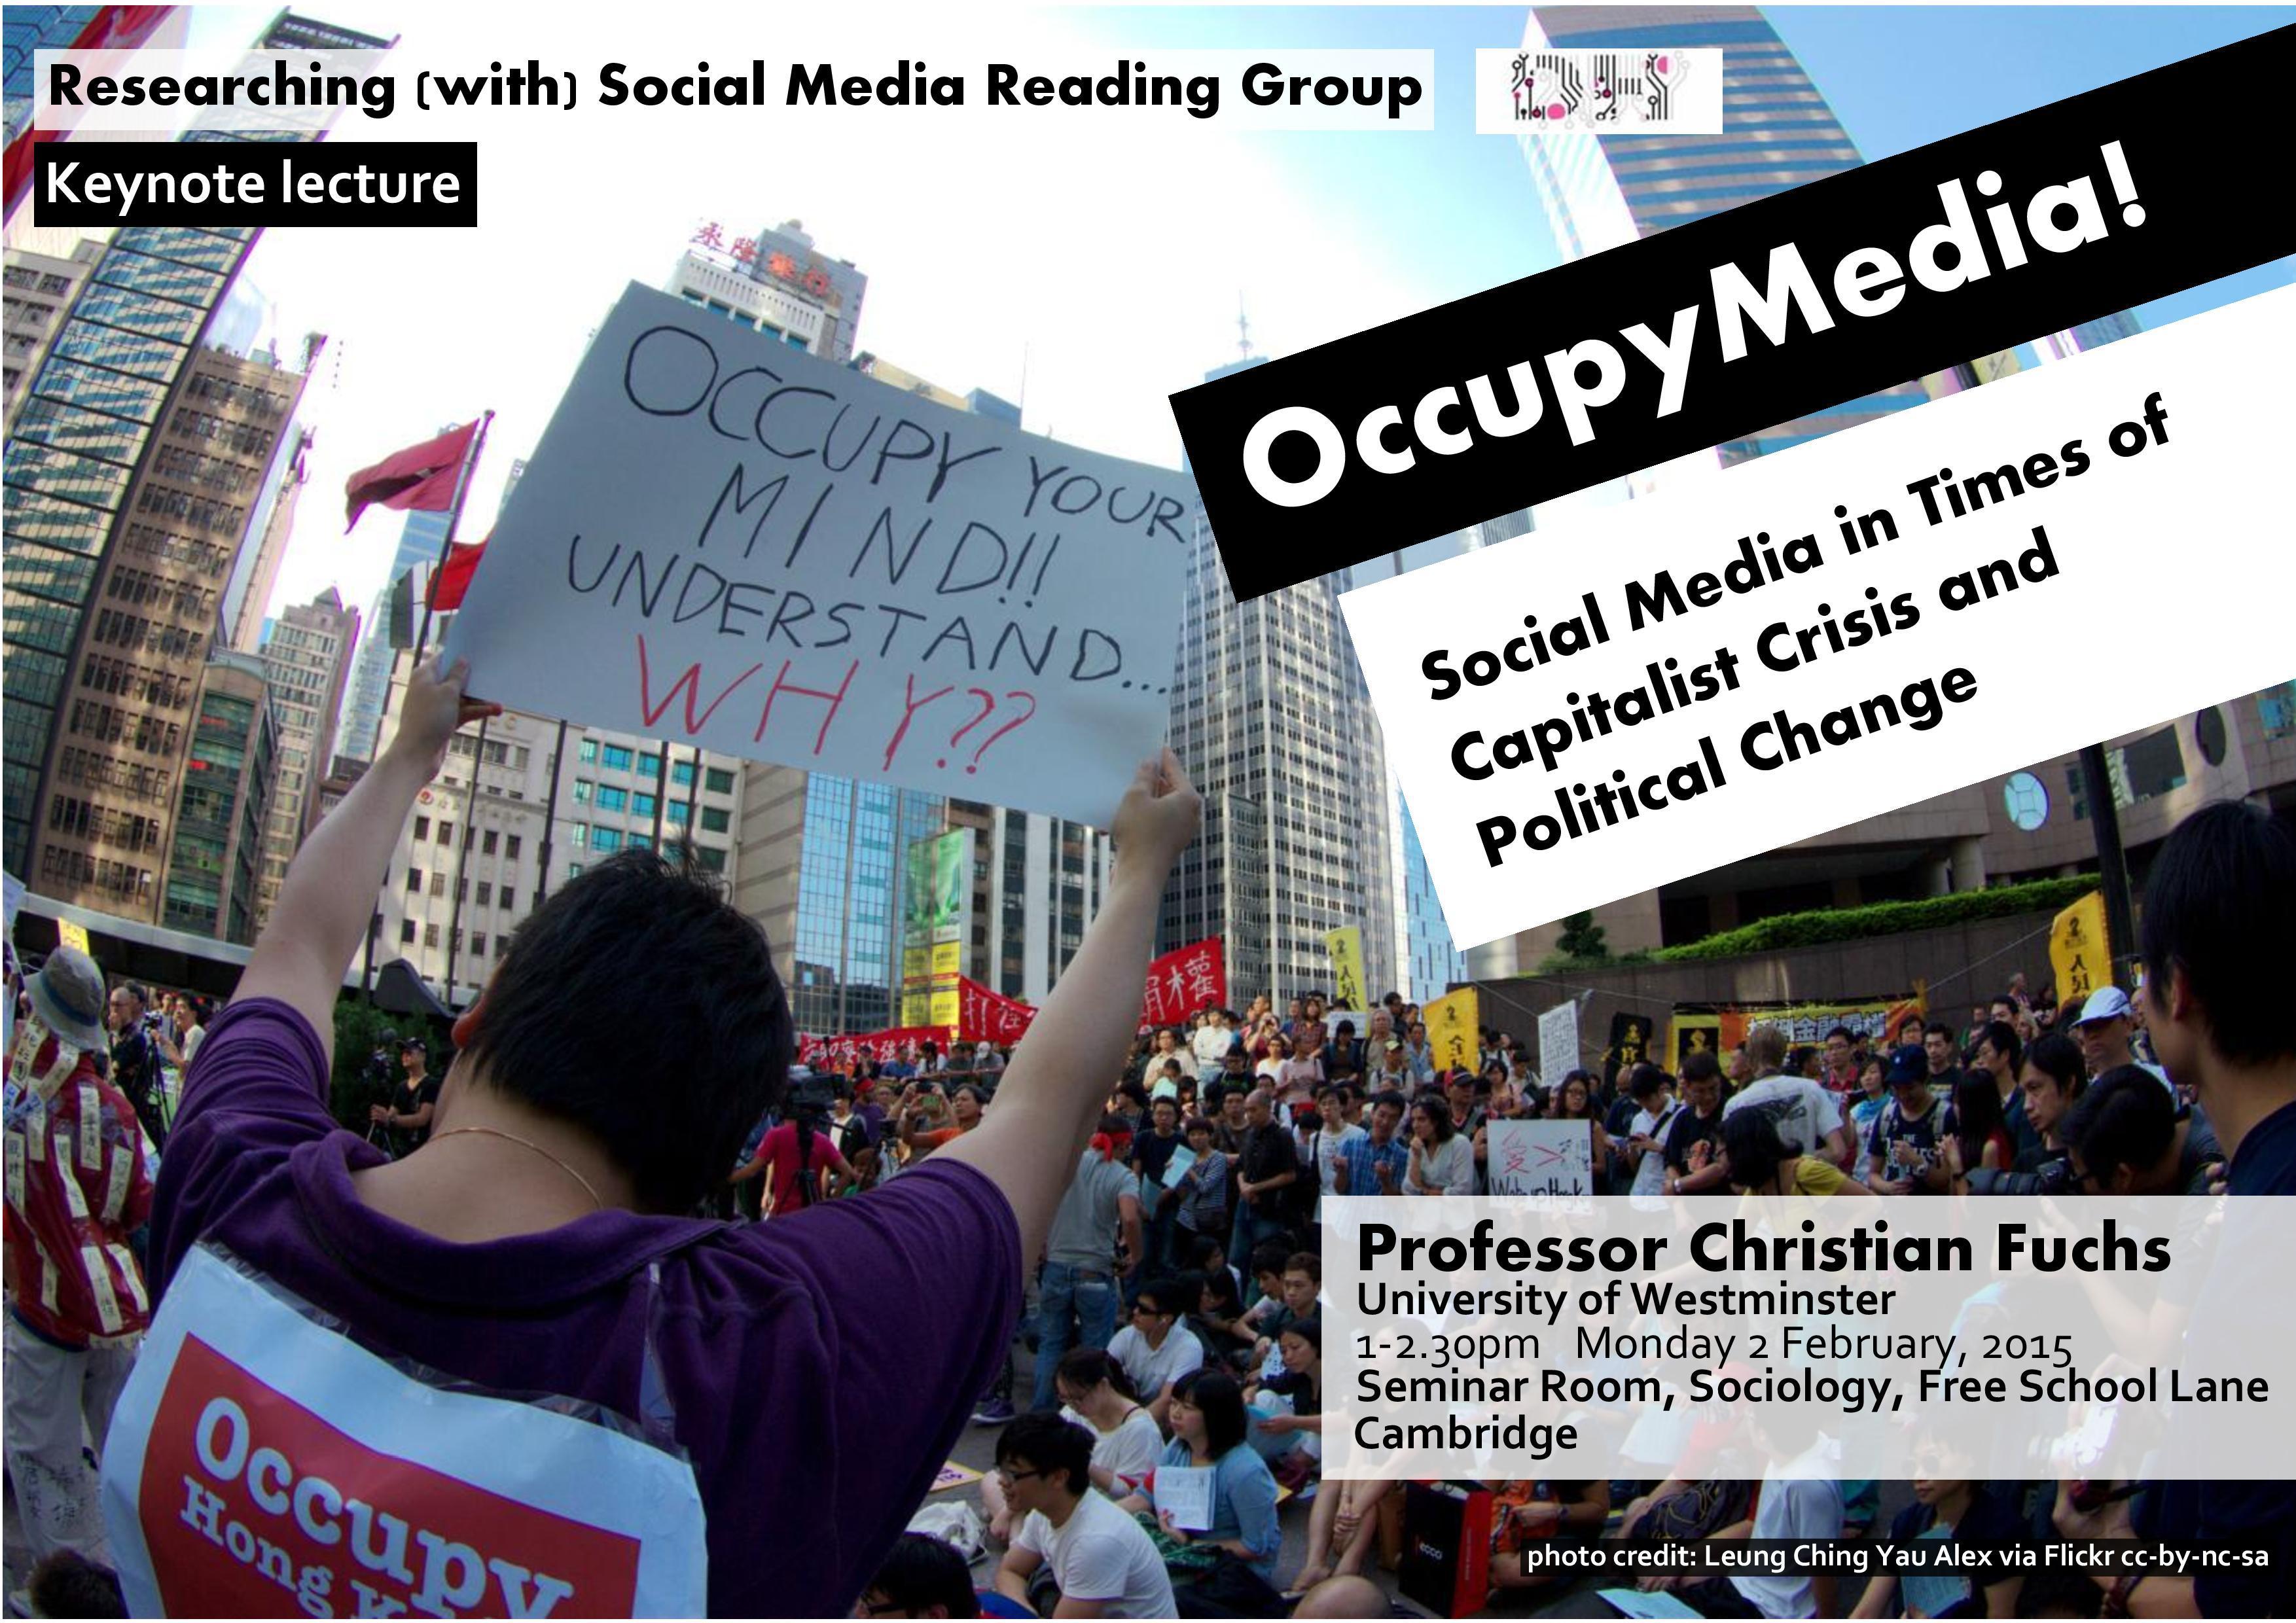 Christian Fuchs, 'OccupyMedia!', 2nd February 2015, 1pm